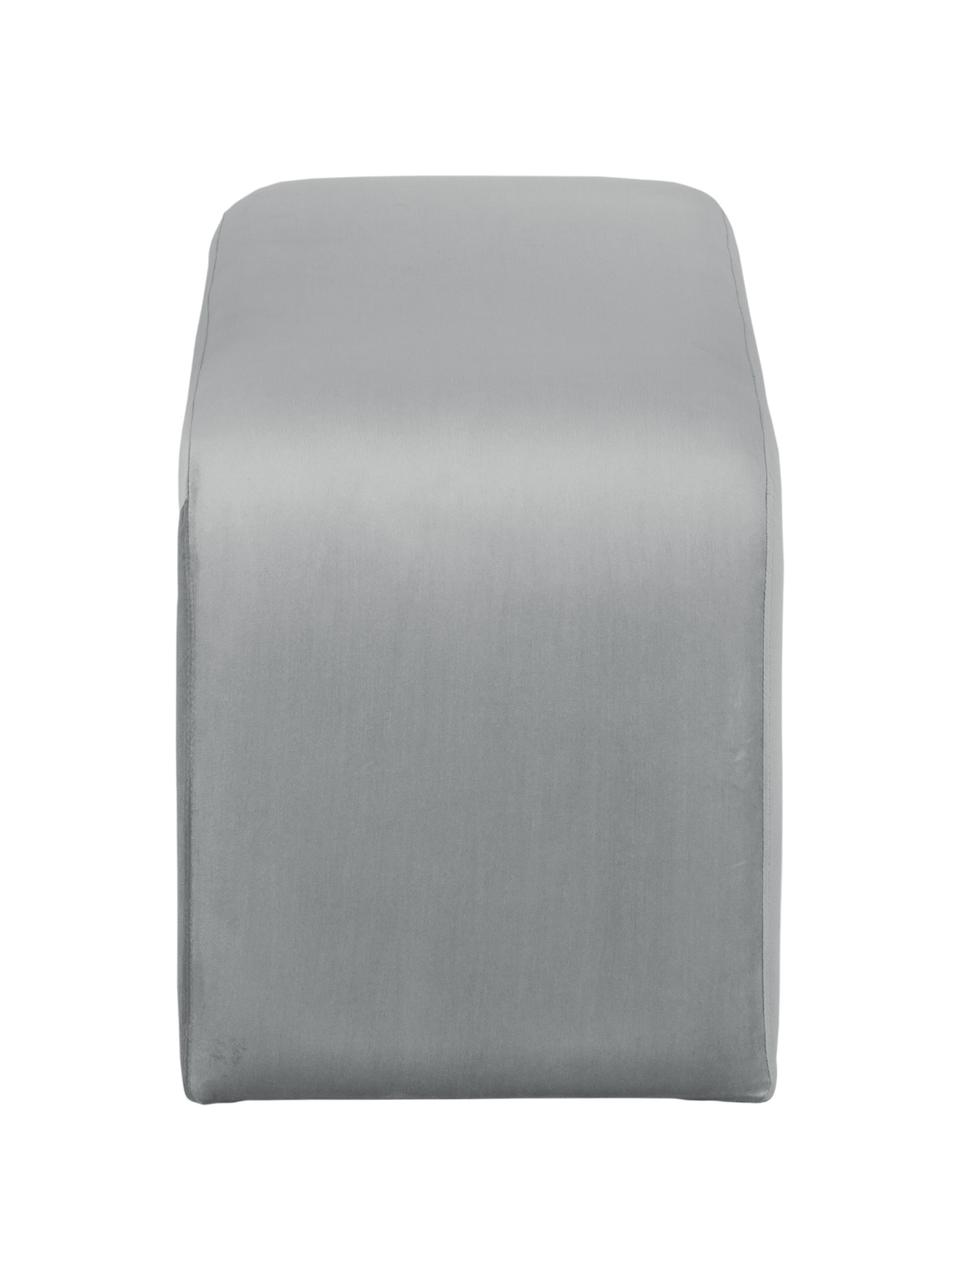 Banquette moderne velours Penelope, Velours gris